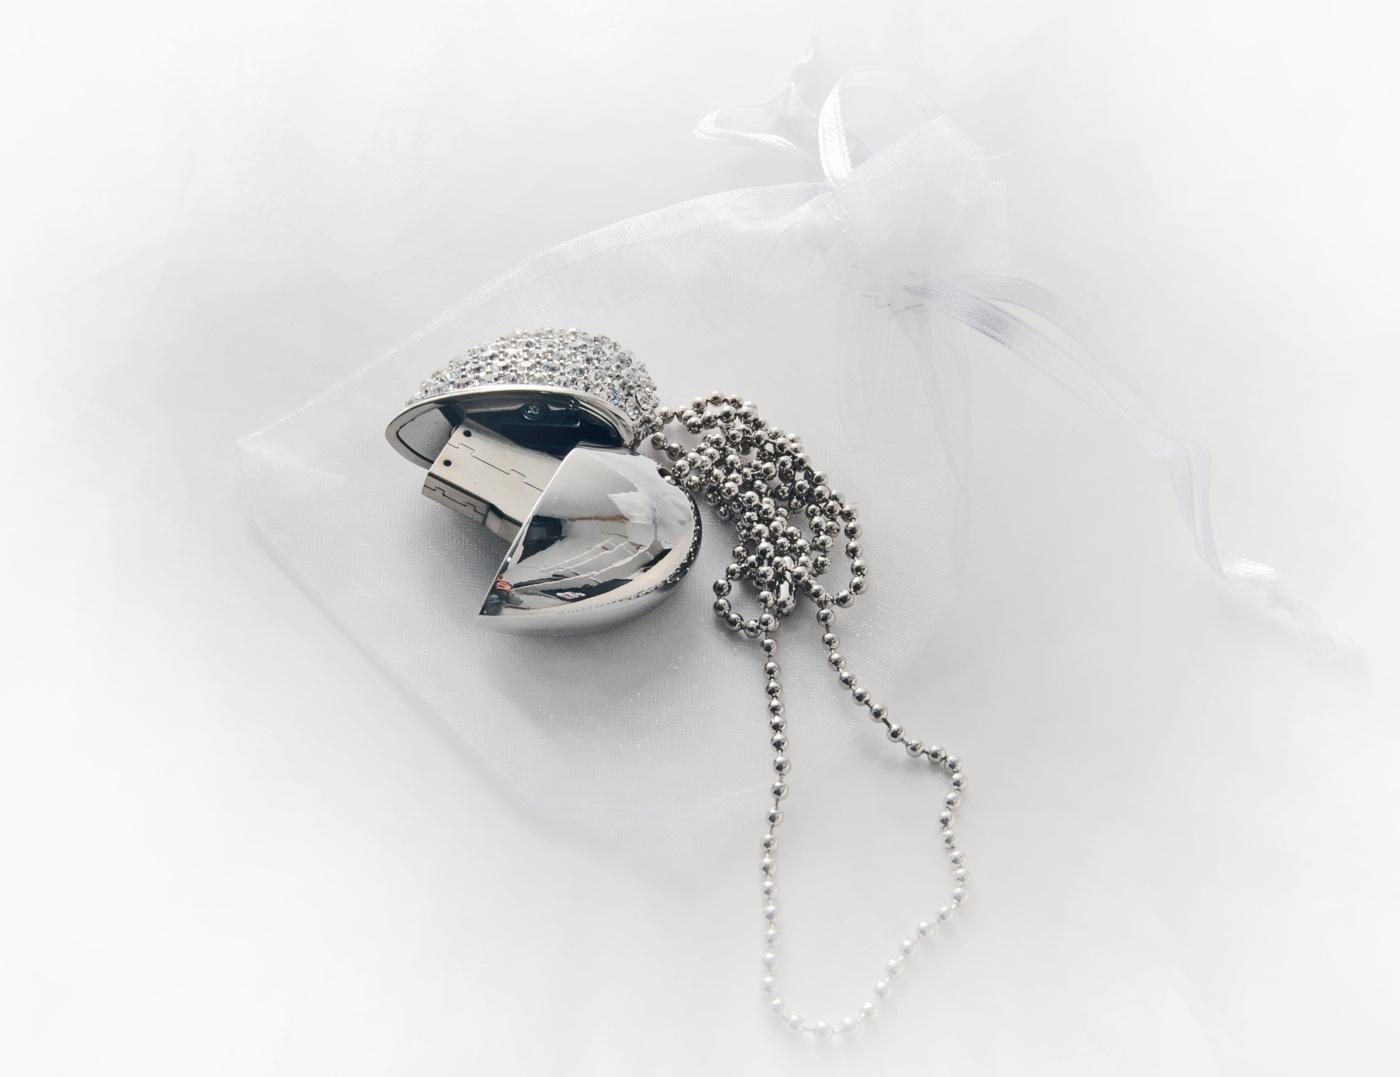 silverhjärta 8 gb